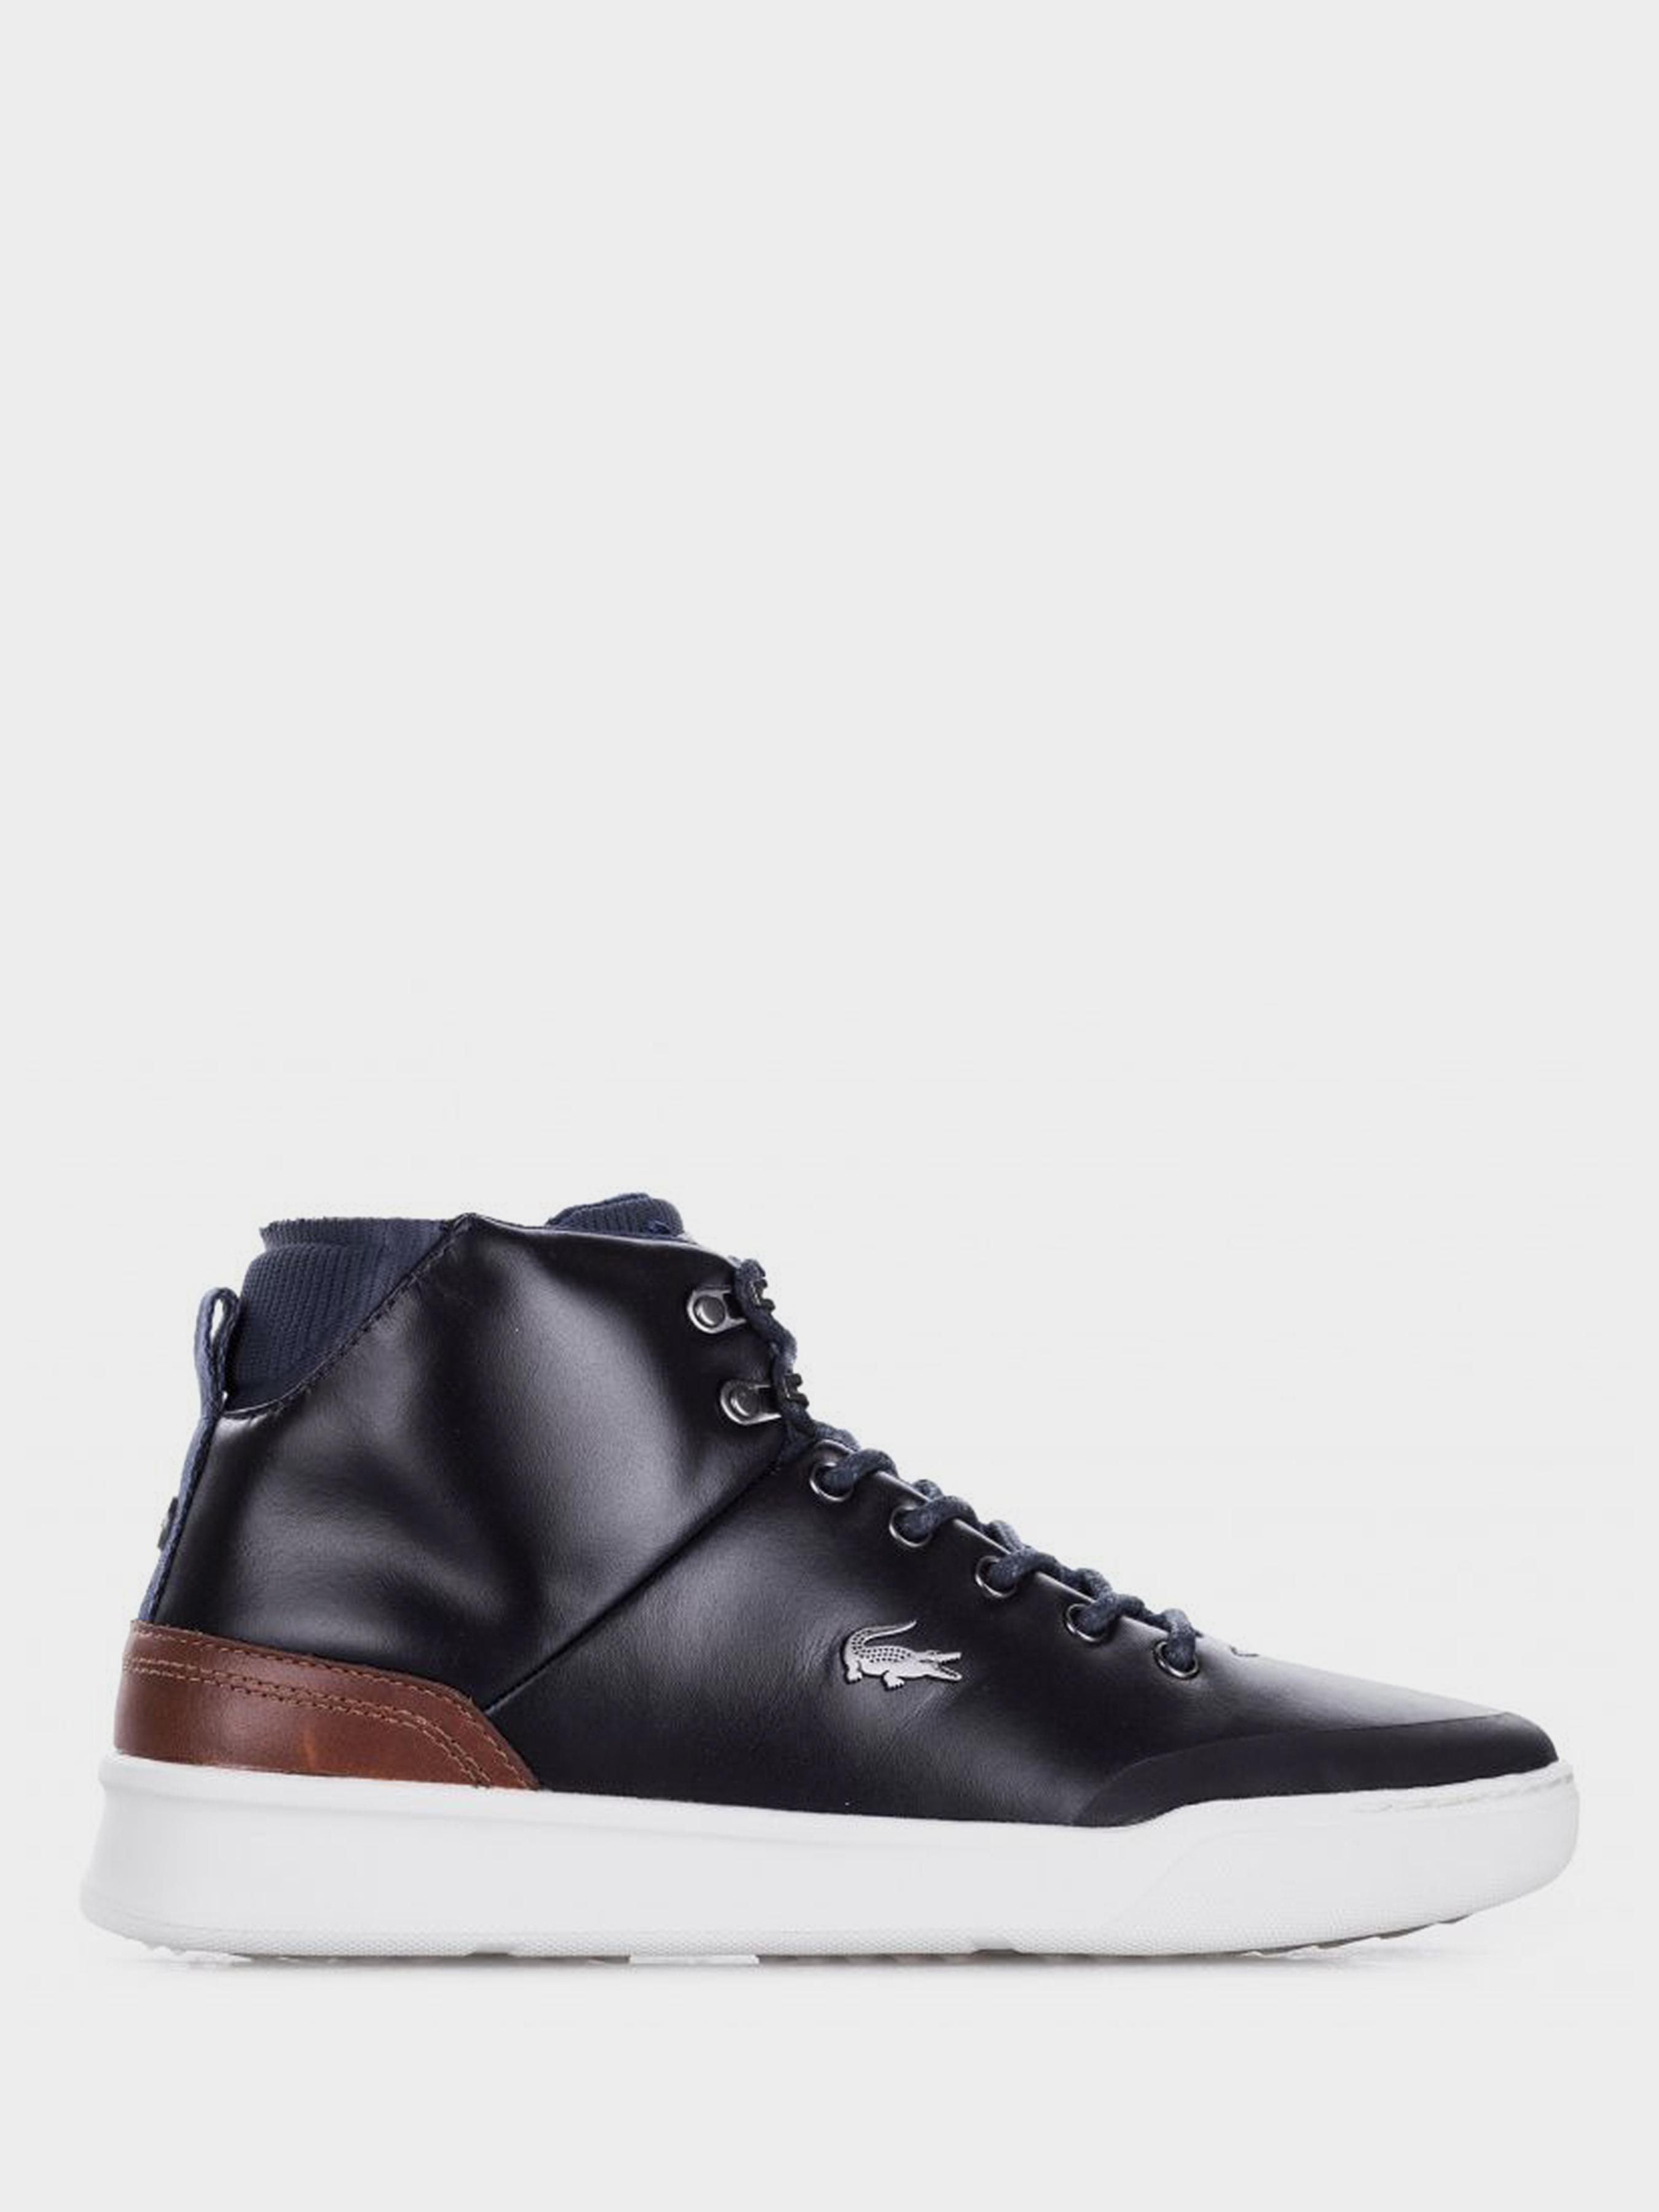 Ботинки для мужчин Lacoste EXPLORATEUR CLASSIC LK175 цена обуви, 2017